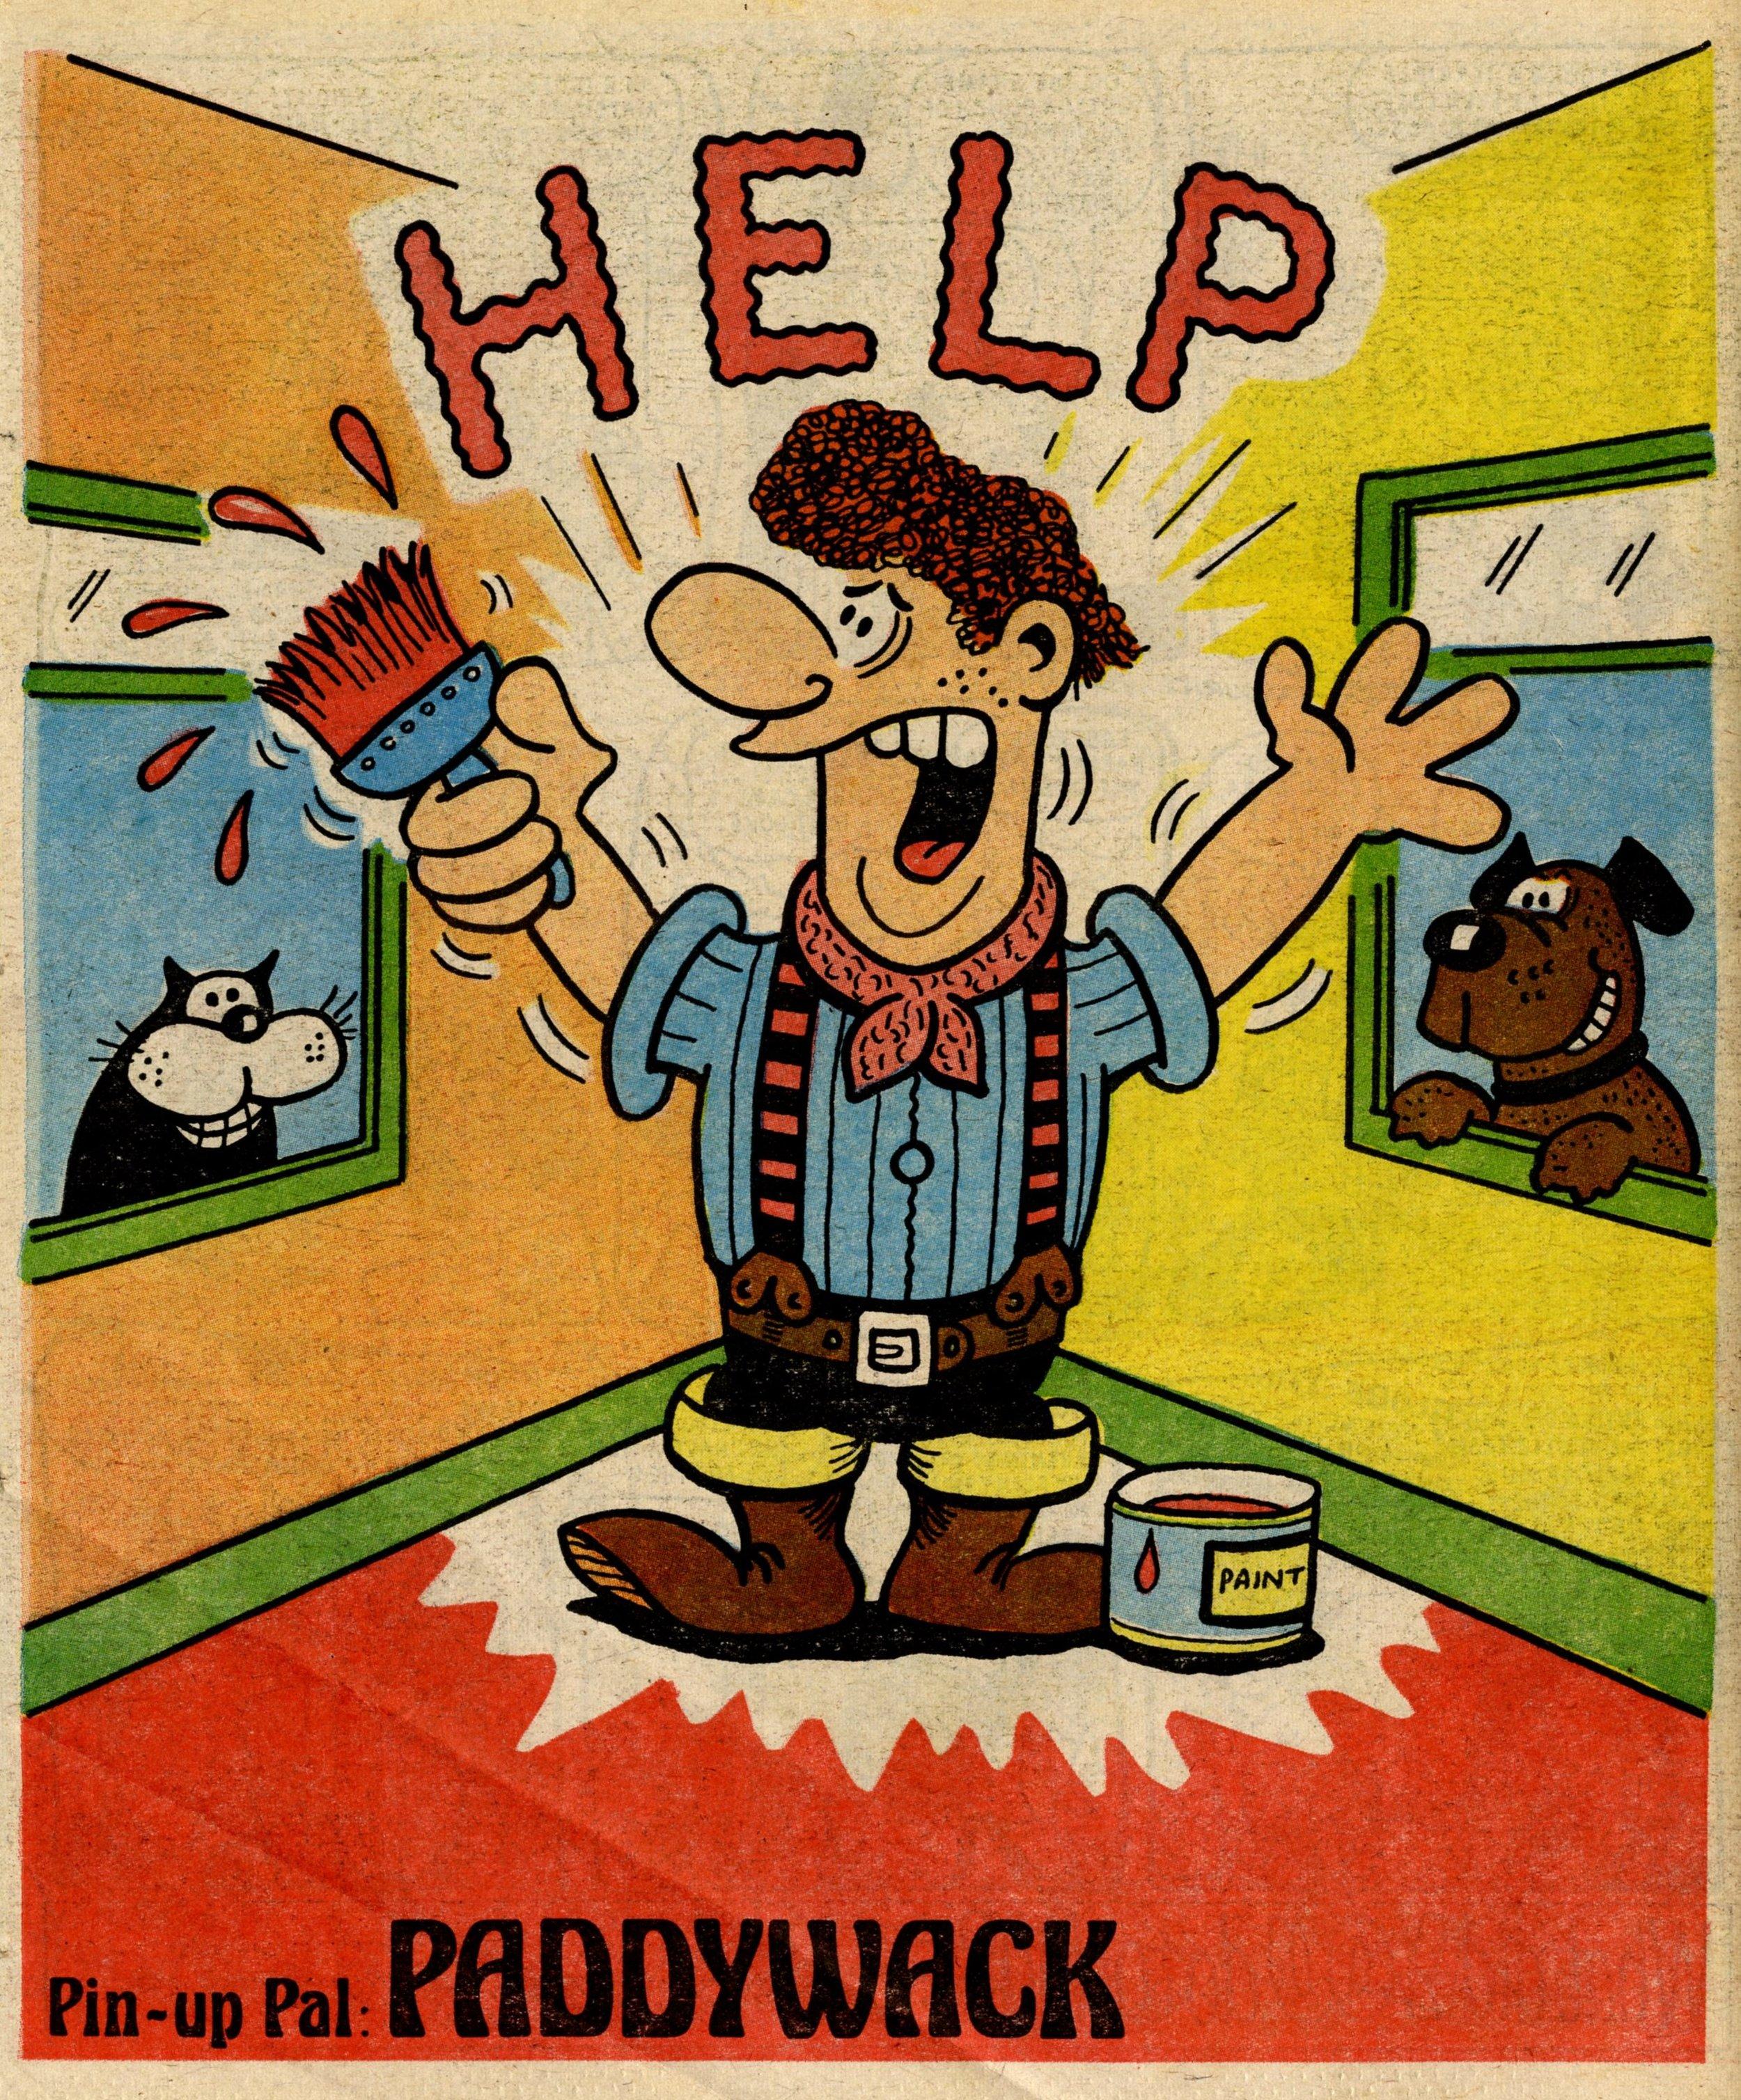 Pin-up Pal: Paddywack (artist Jack Clayton), 27 January 1979